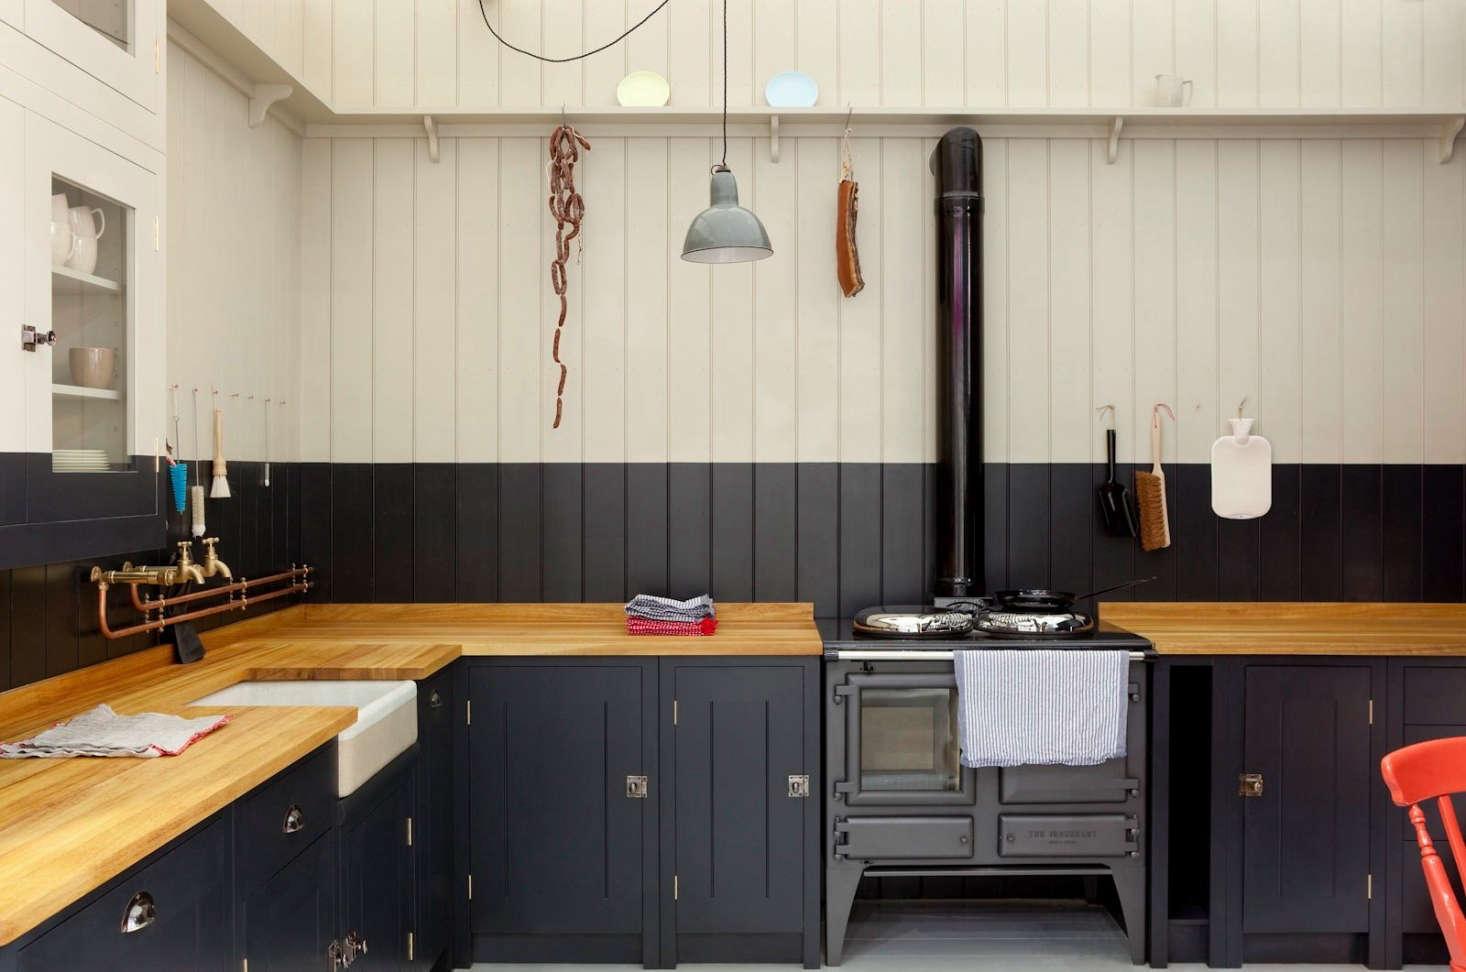 A butcher block countertop in a British Standard Cupboard Kitchen by Plain English.